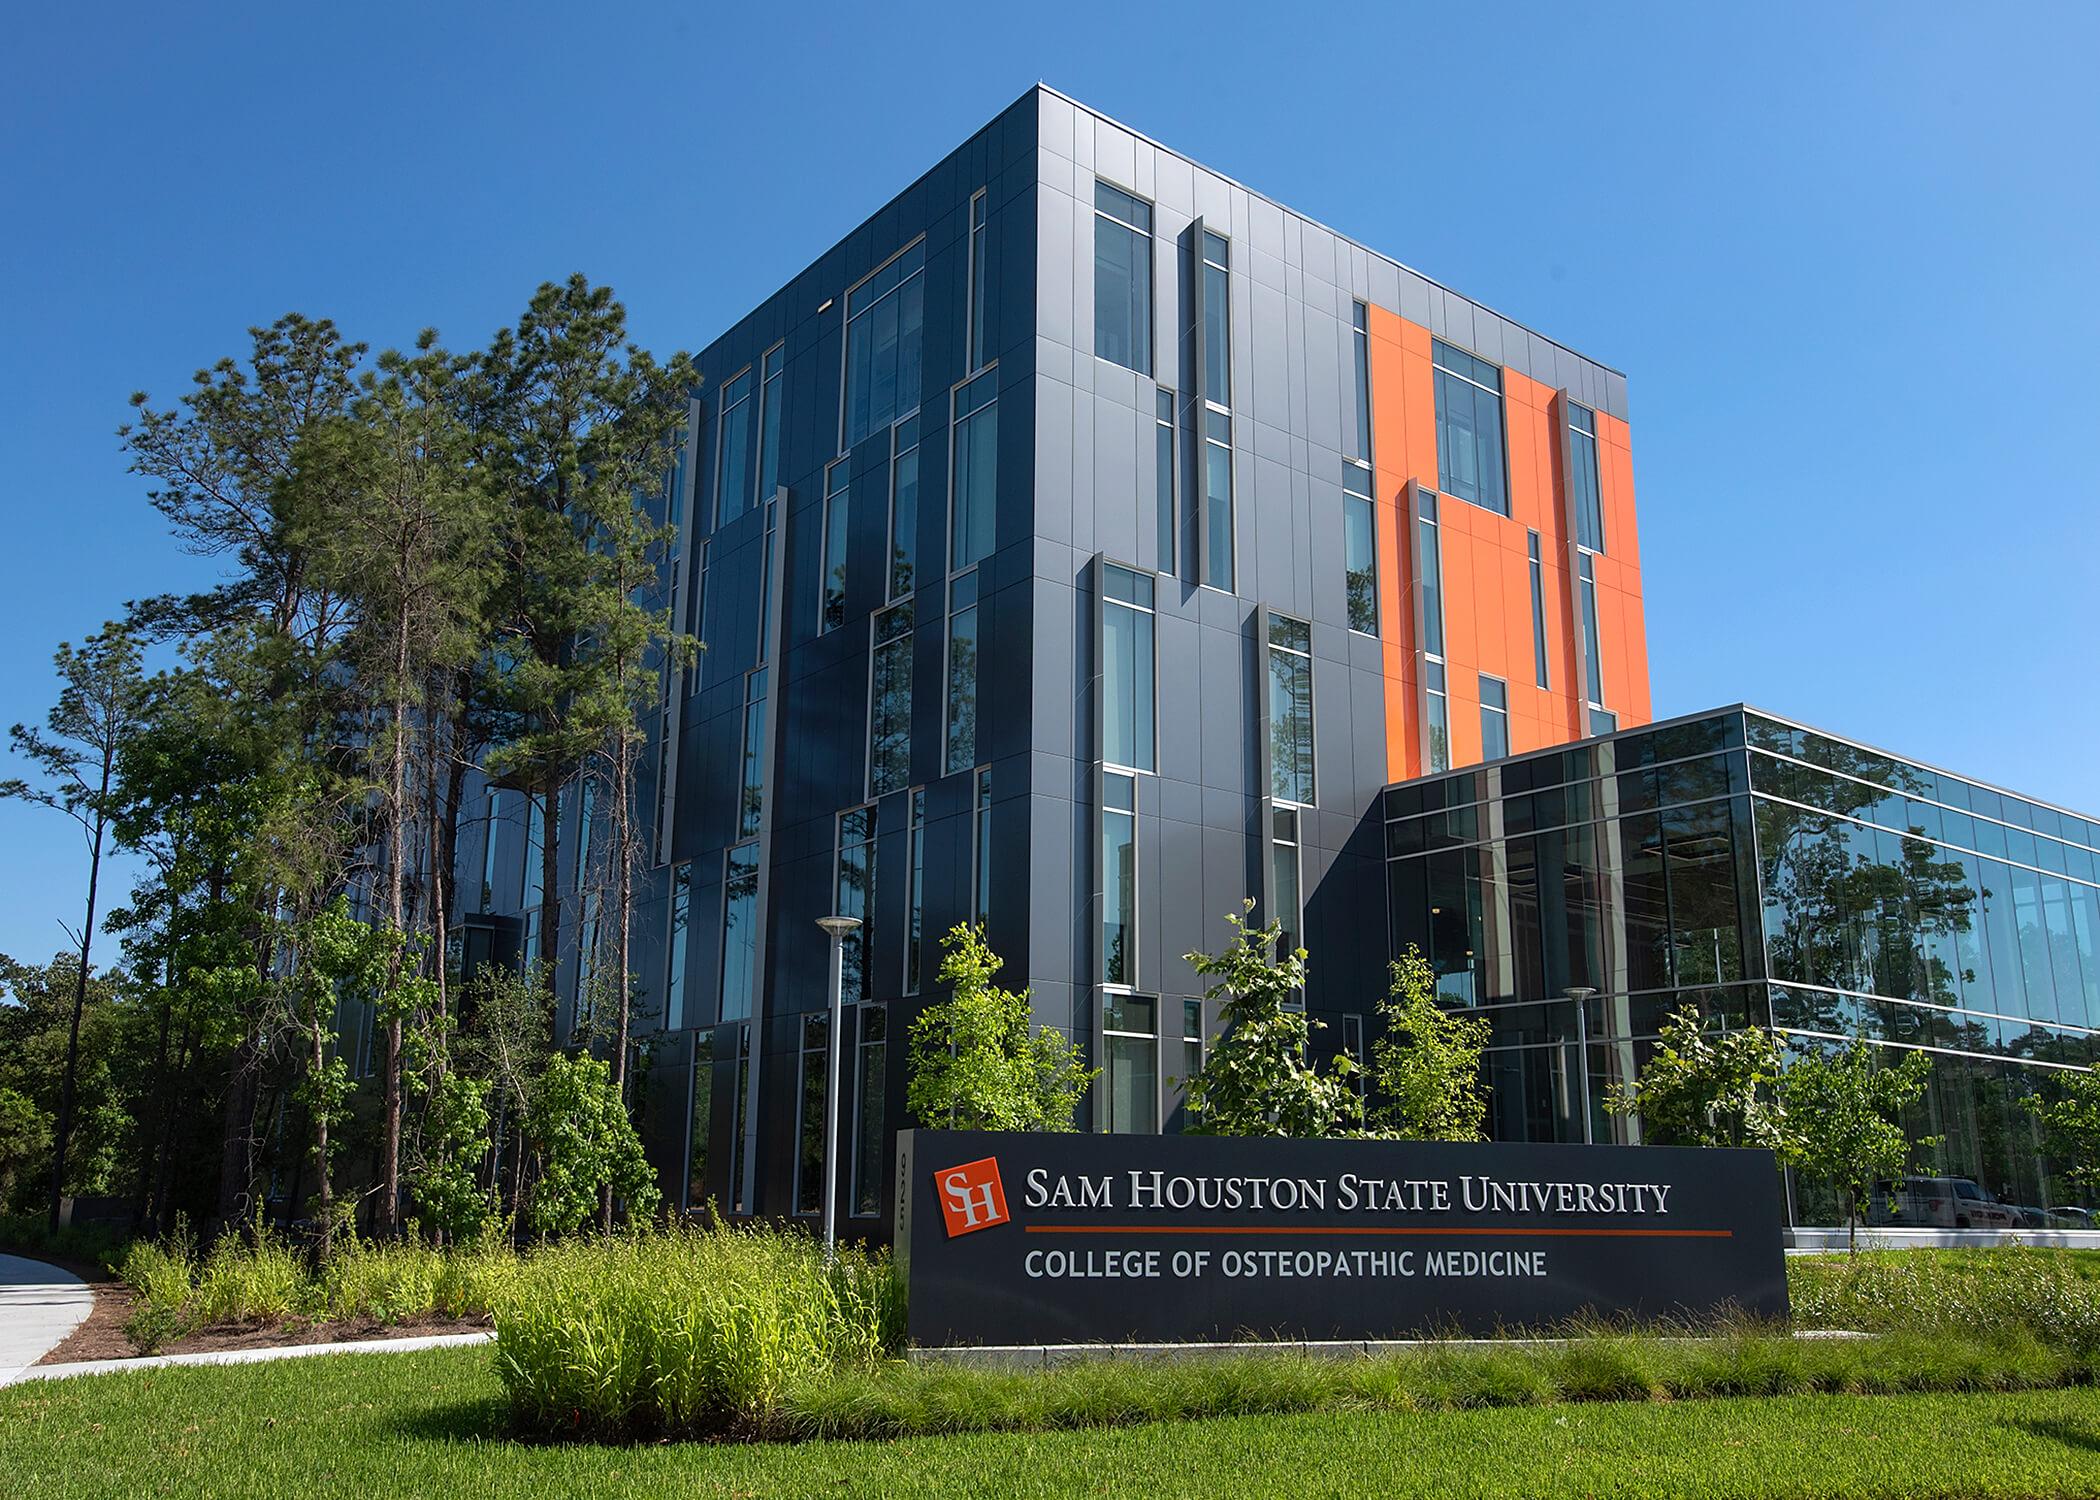 SHSU College of Osteopathic Medicine